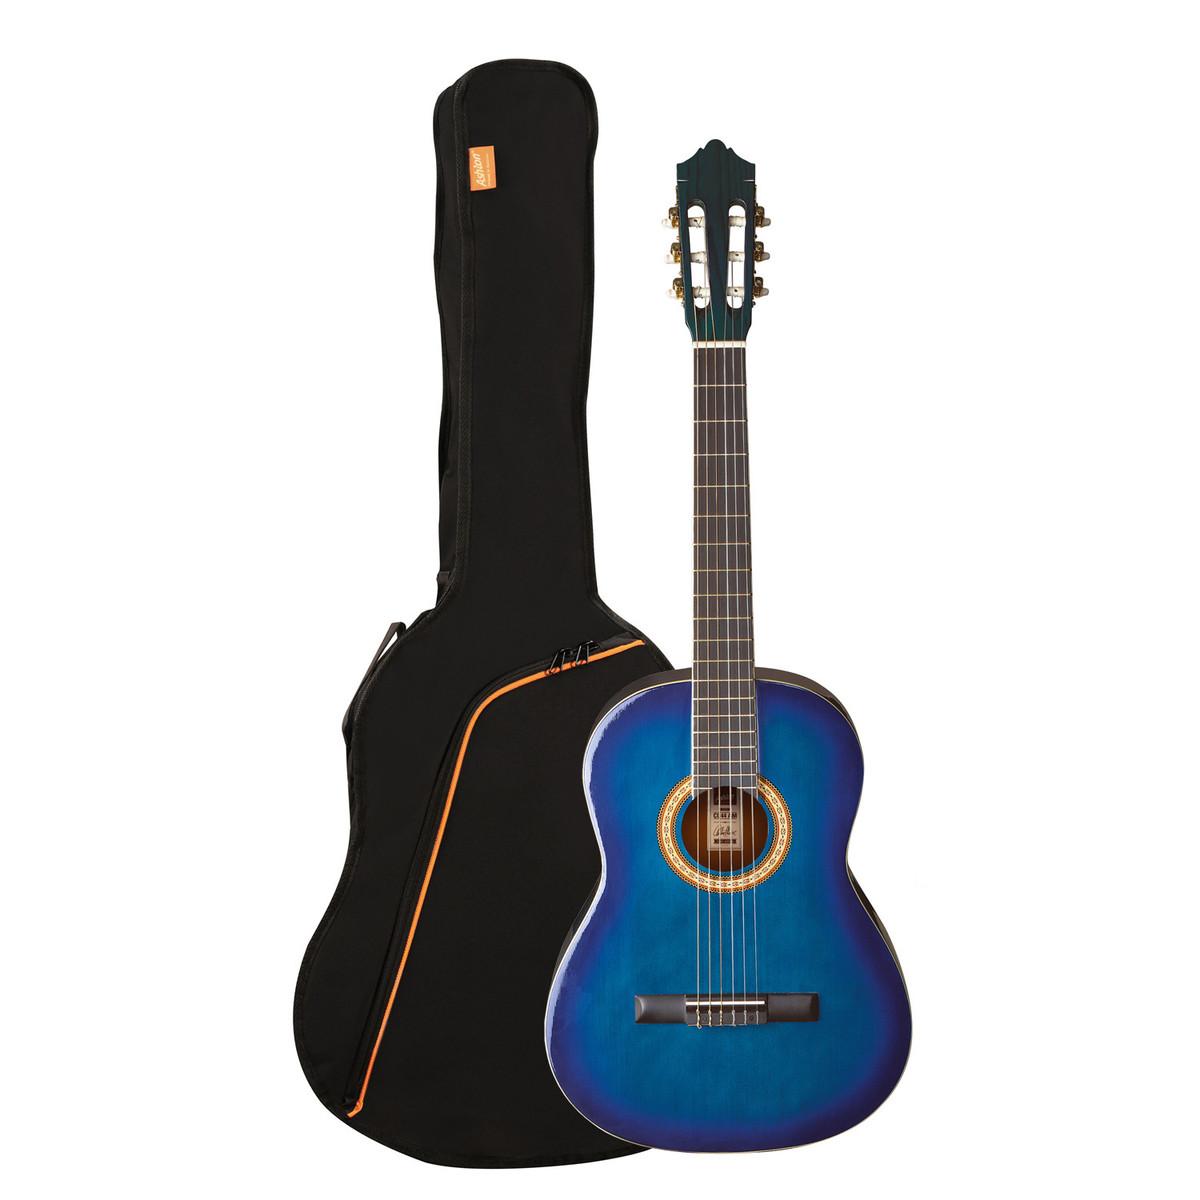 disc ashton spcg34 3 4 taille guitare classique pack bleu. Black Bedroom Furniture Sets. Home Design Ideas